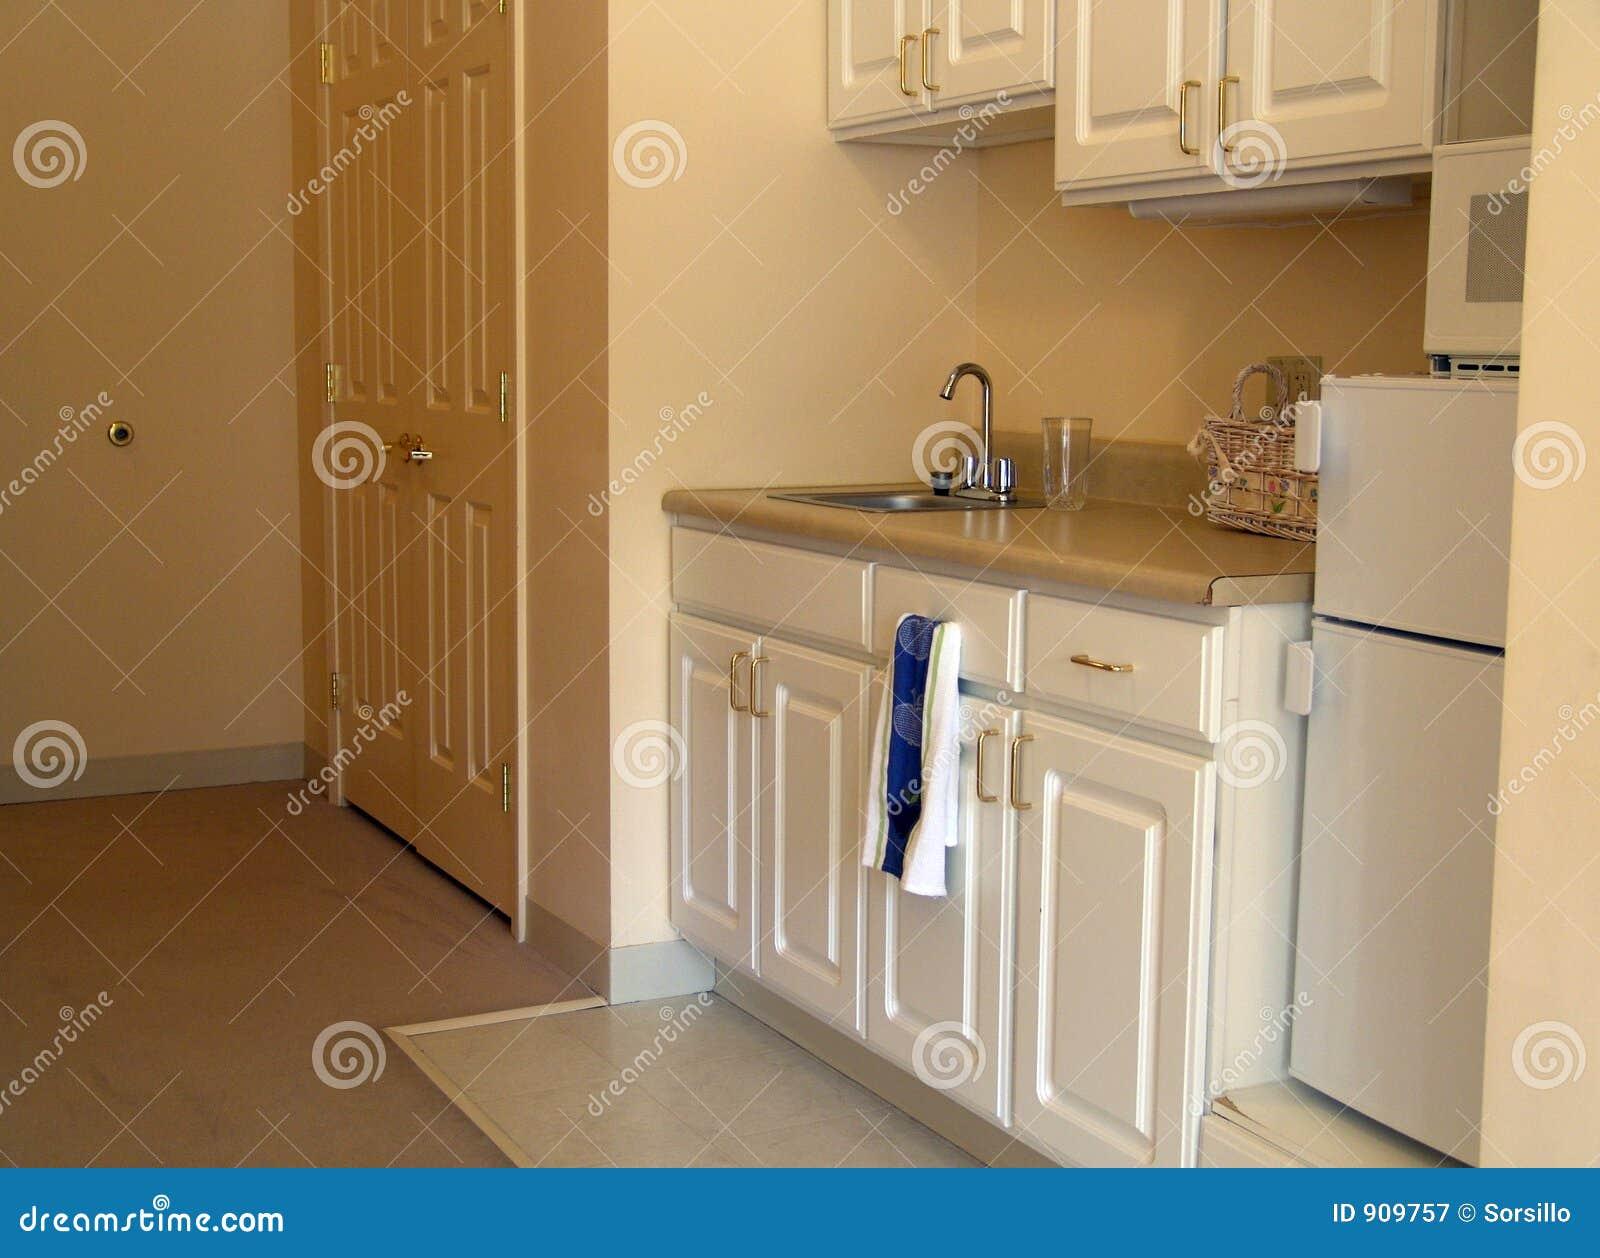 Cozinha pequena no apartamento fotografia de stock royalty free imagem 909757 - Kleine keuken uitgerust voor studio ...